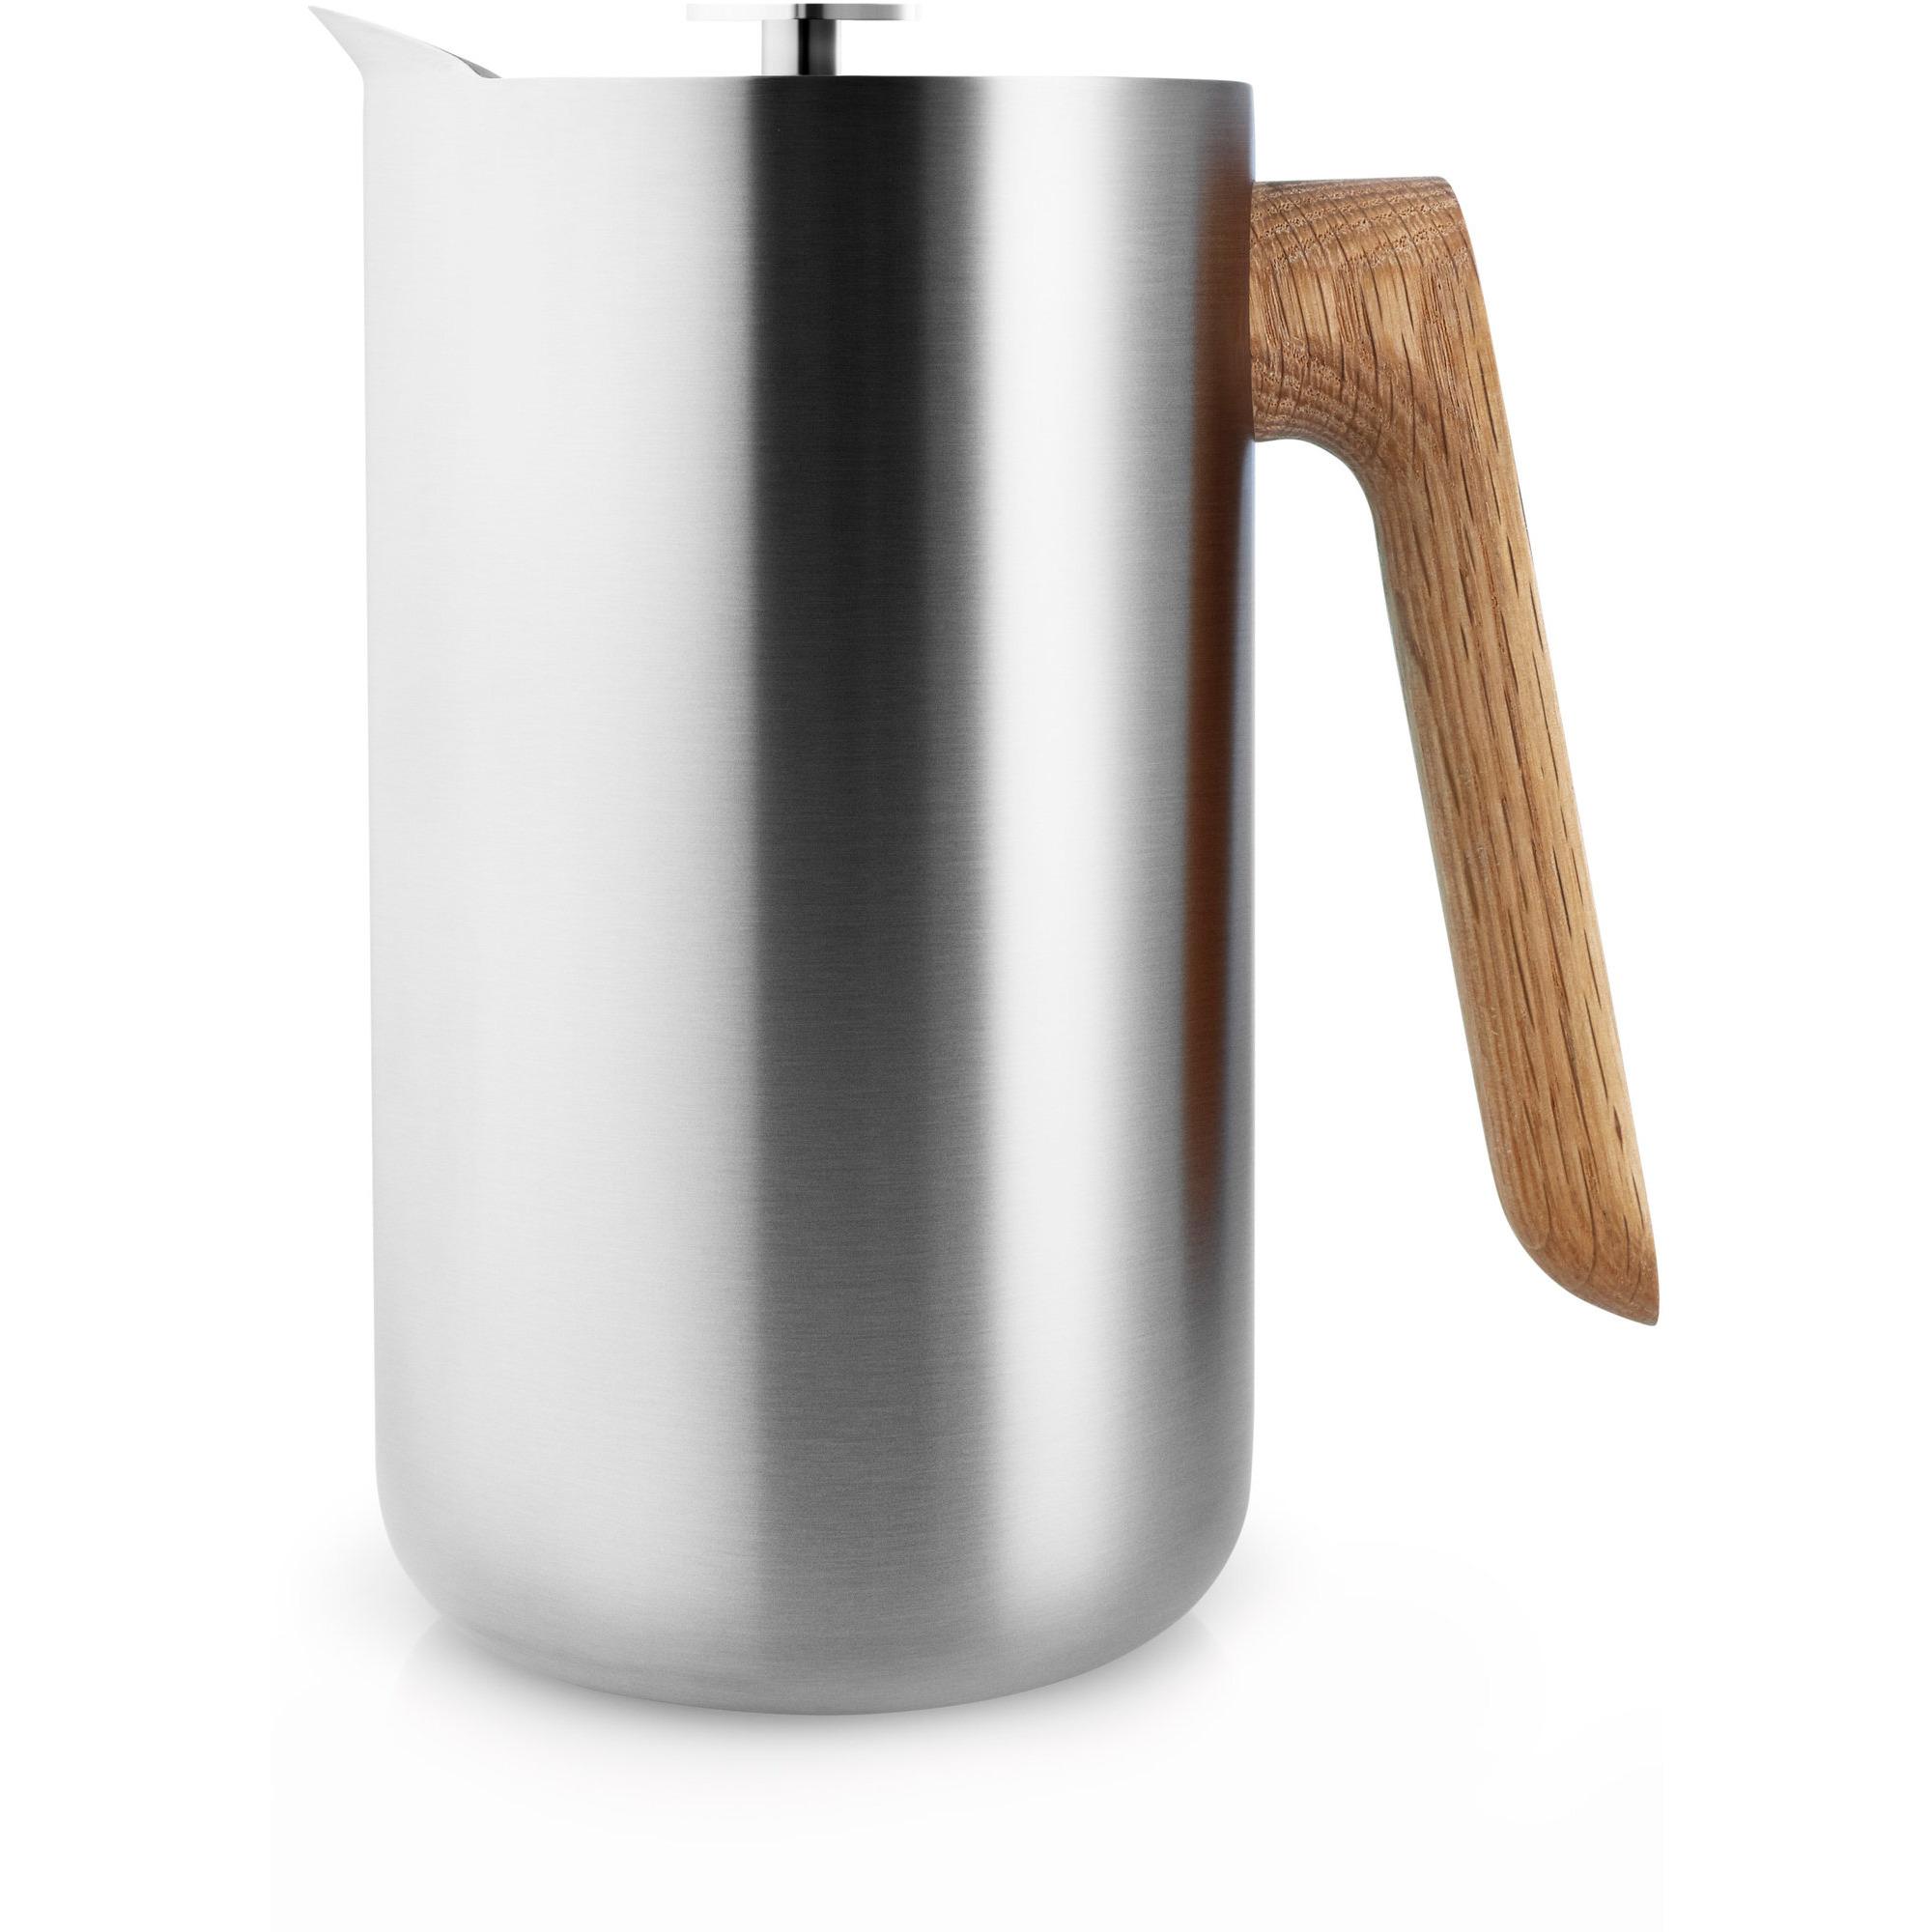 Eva Solo Termospresskanna Nordic Kitchen Rostfritt stål